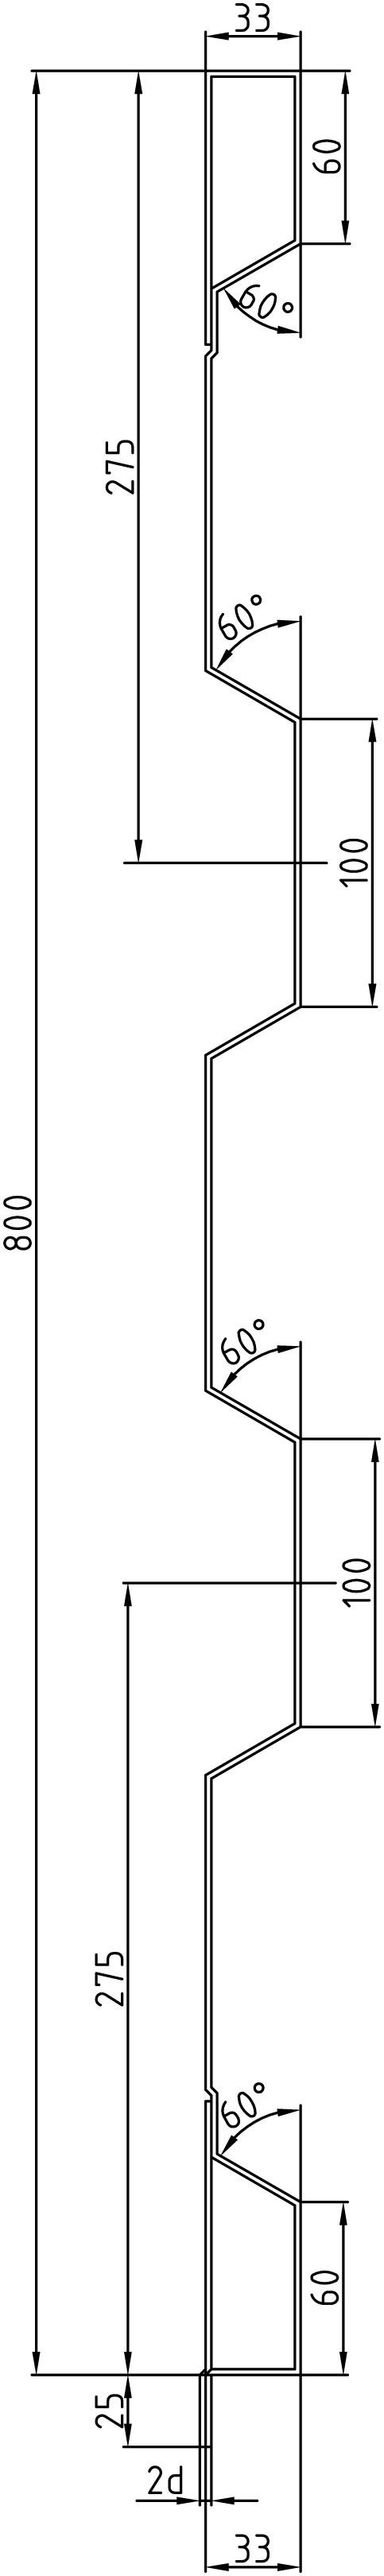 Brantner Kipper und Anhänger - 800x2x2370 front attachment wall incl. trailing